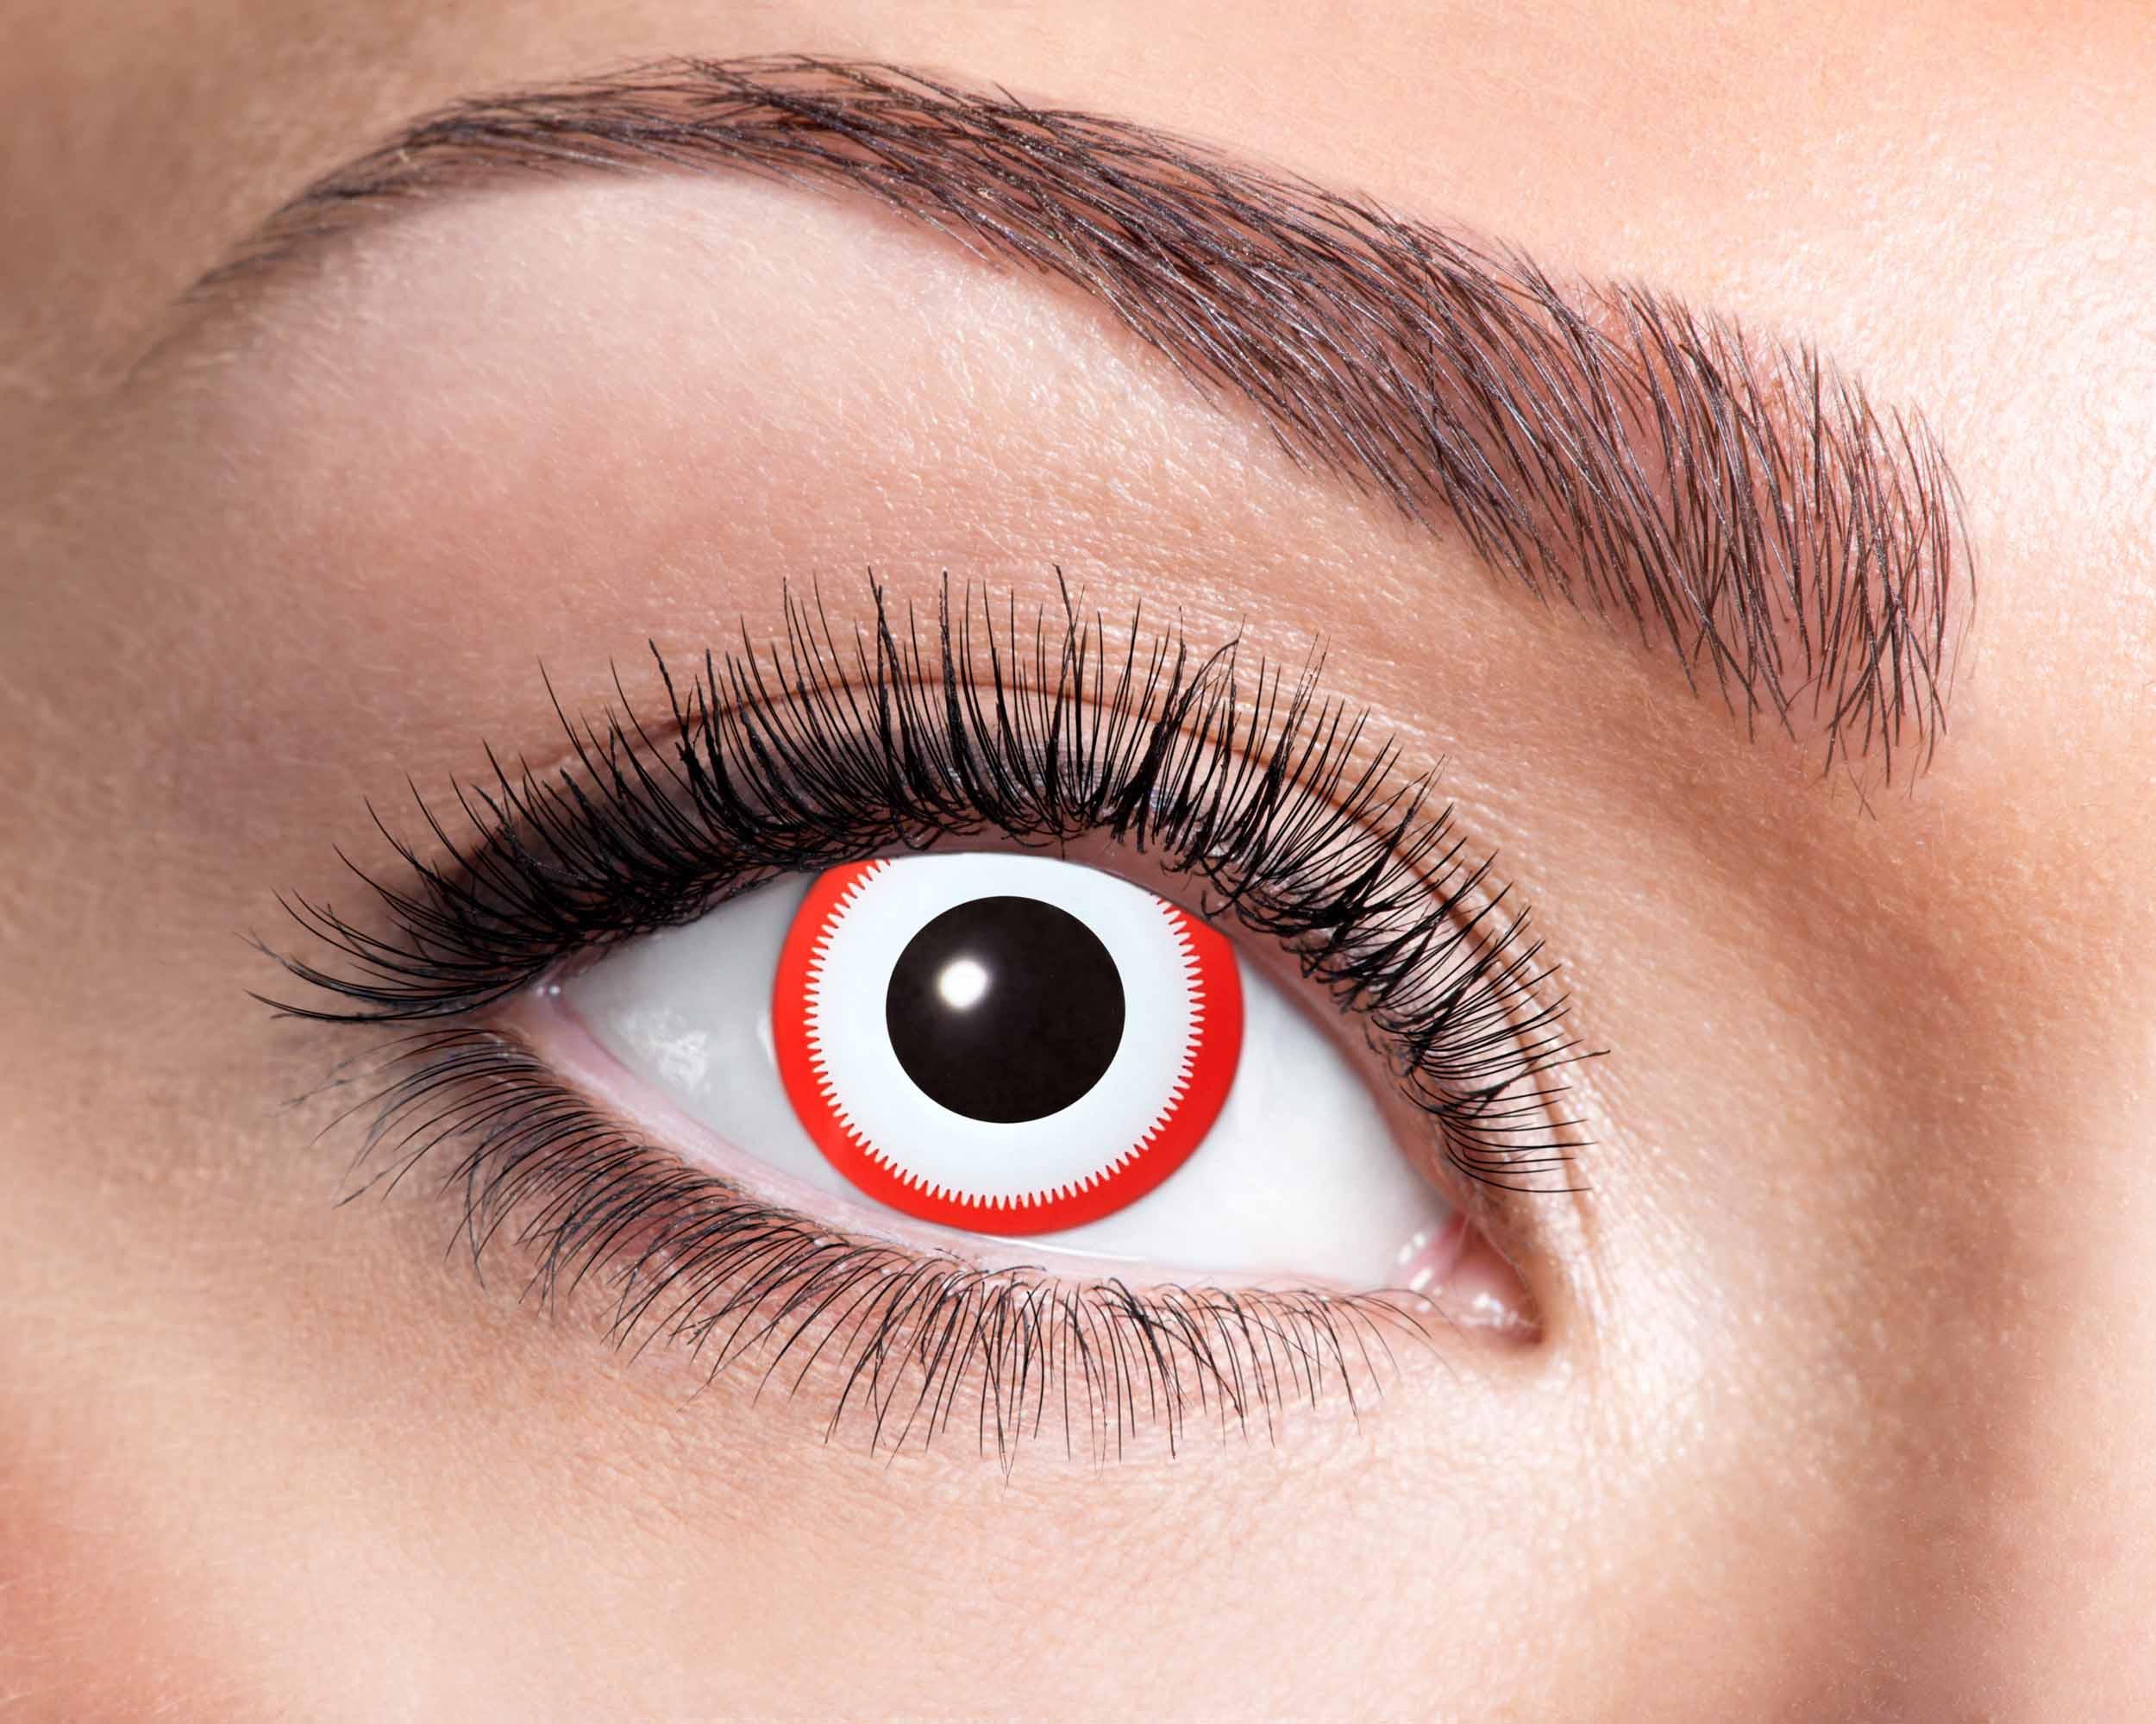 Rundsav kontaktlinser